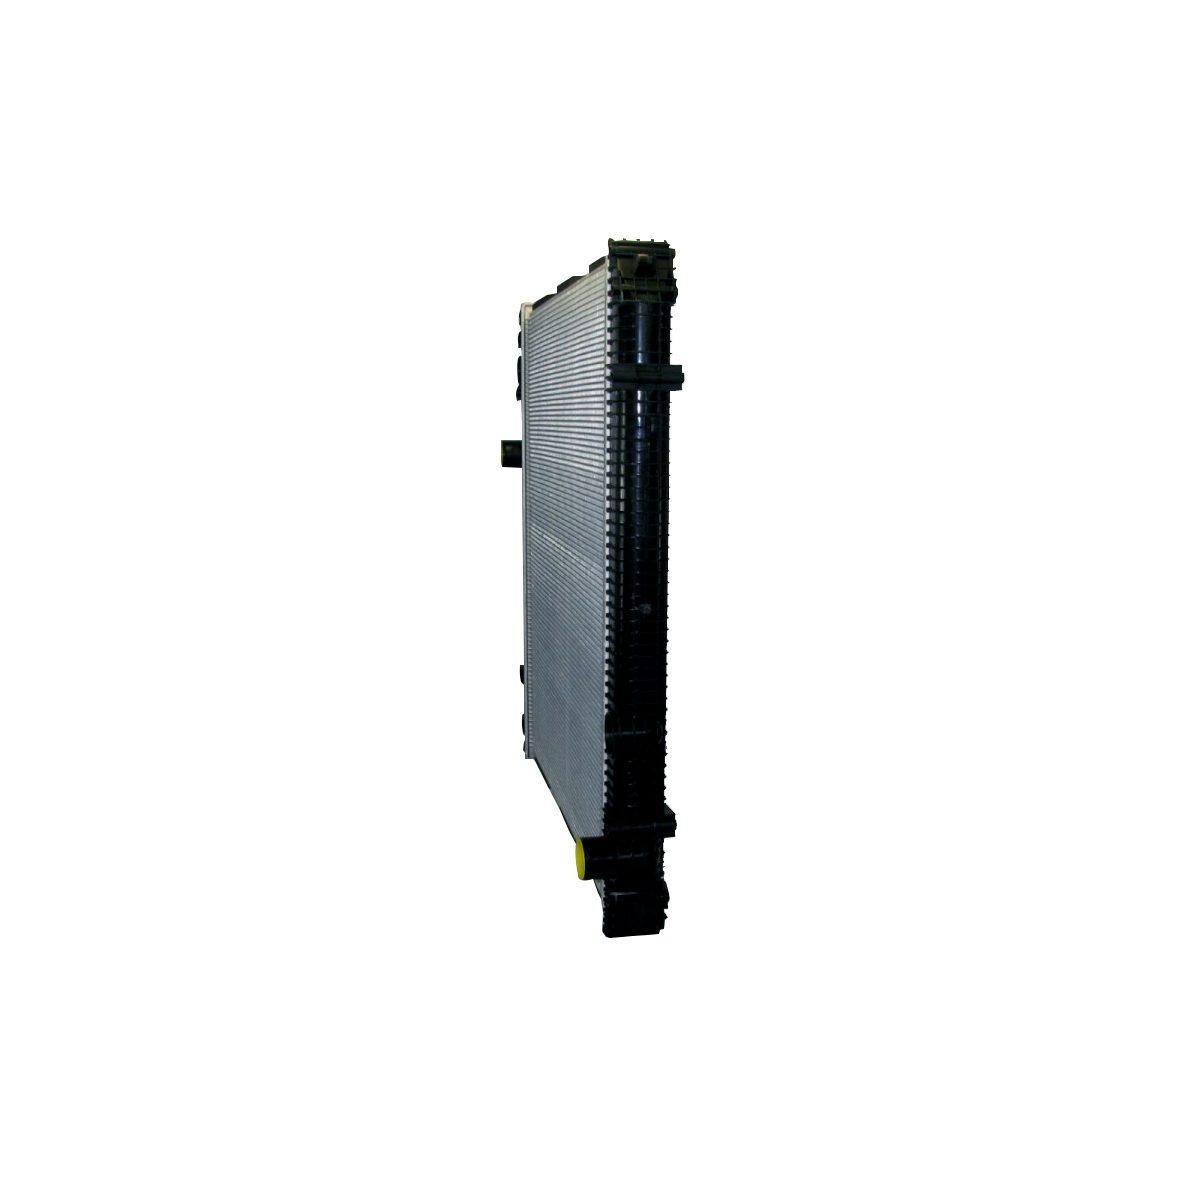 freightliner century class series 03 07 radiator oem v0225001 3